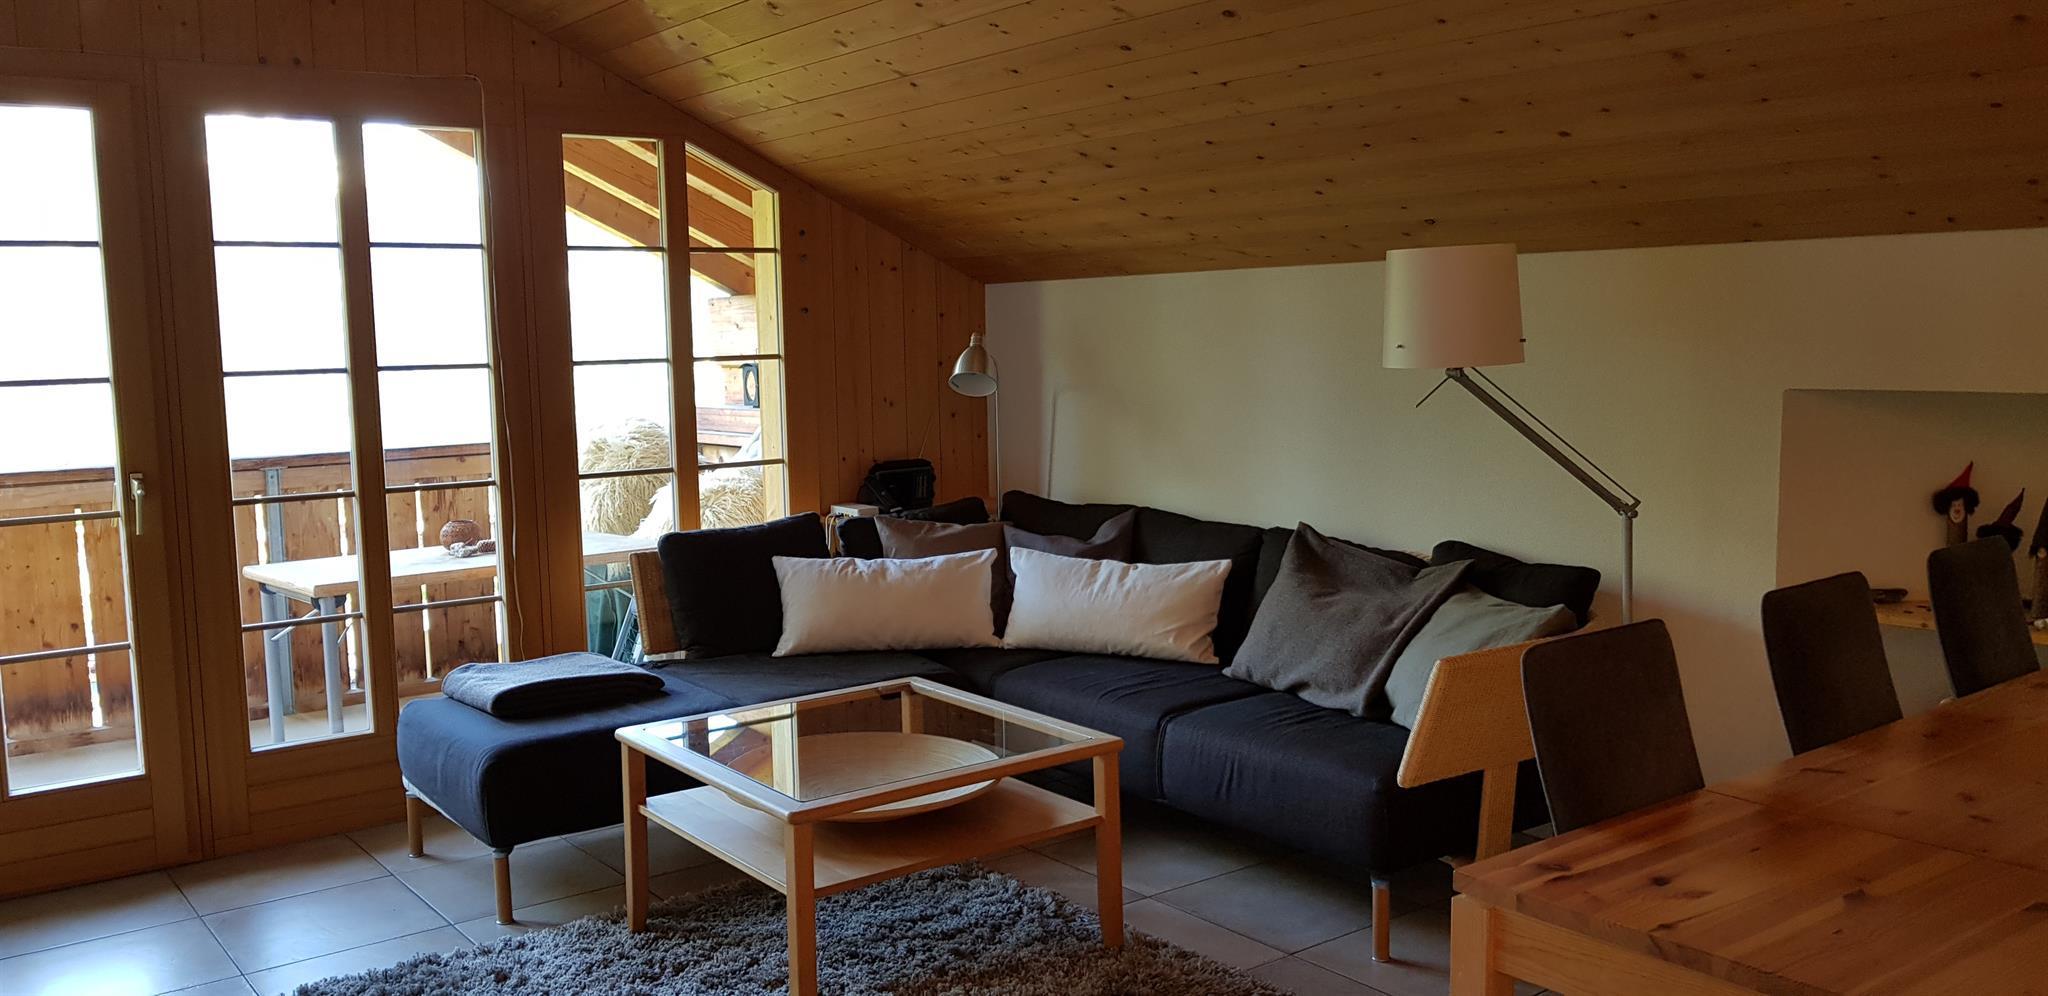 Ferienwohnung Kastor 5-Bettwohnung (2455799), Hasliberg Reuti, Meiringen - Hasliberg, Berner Oberland, Schweiz, Bild 23